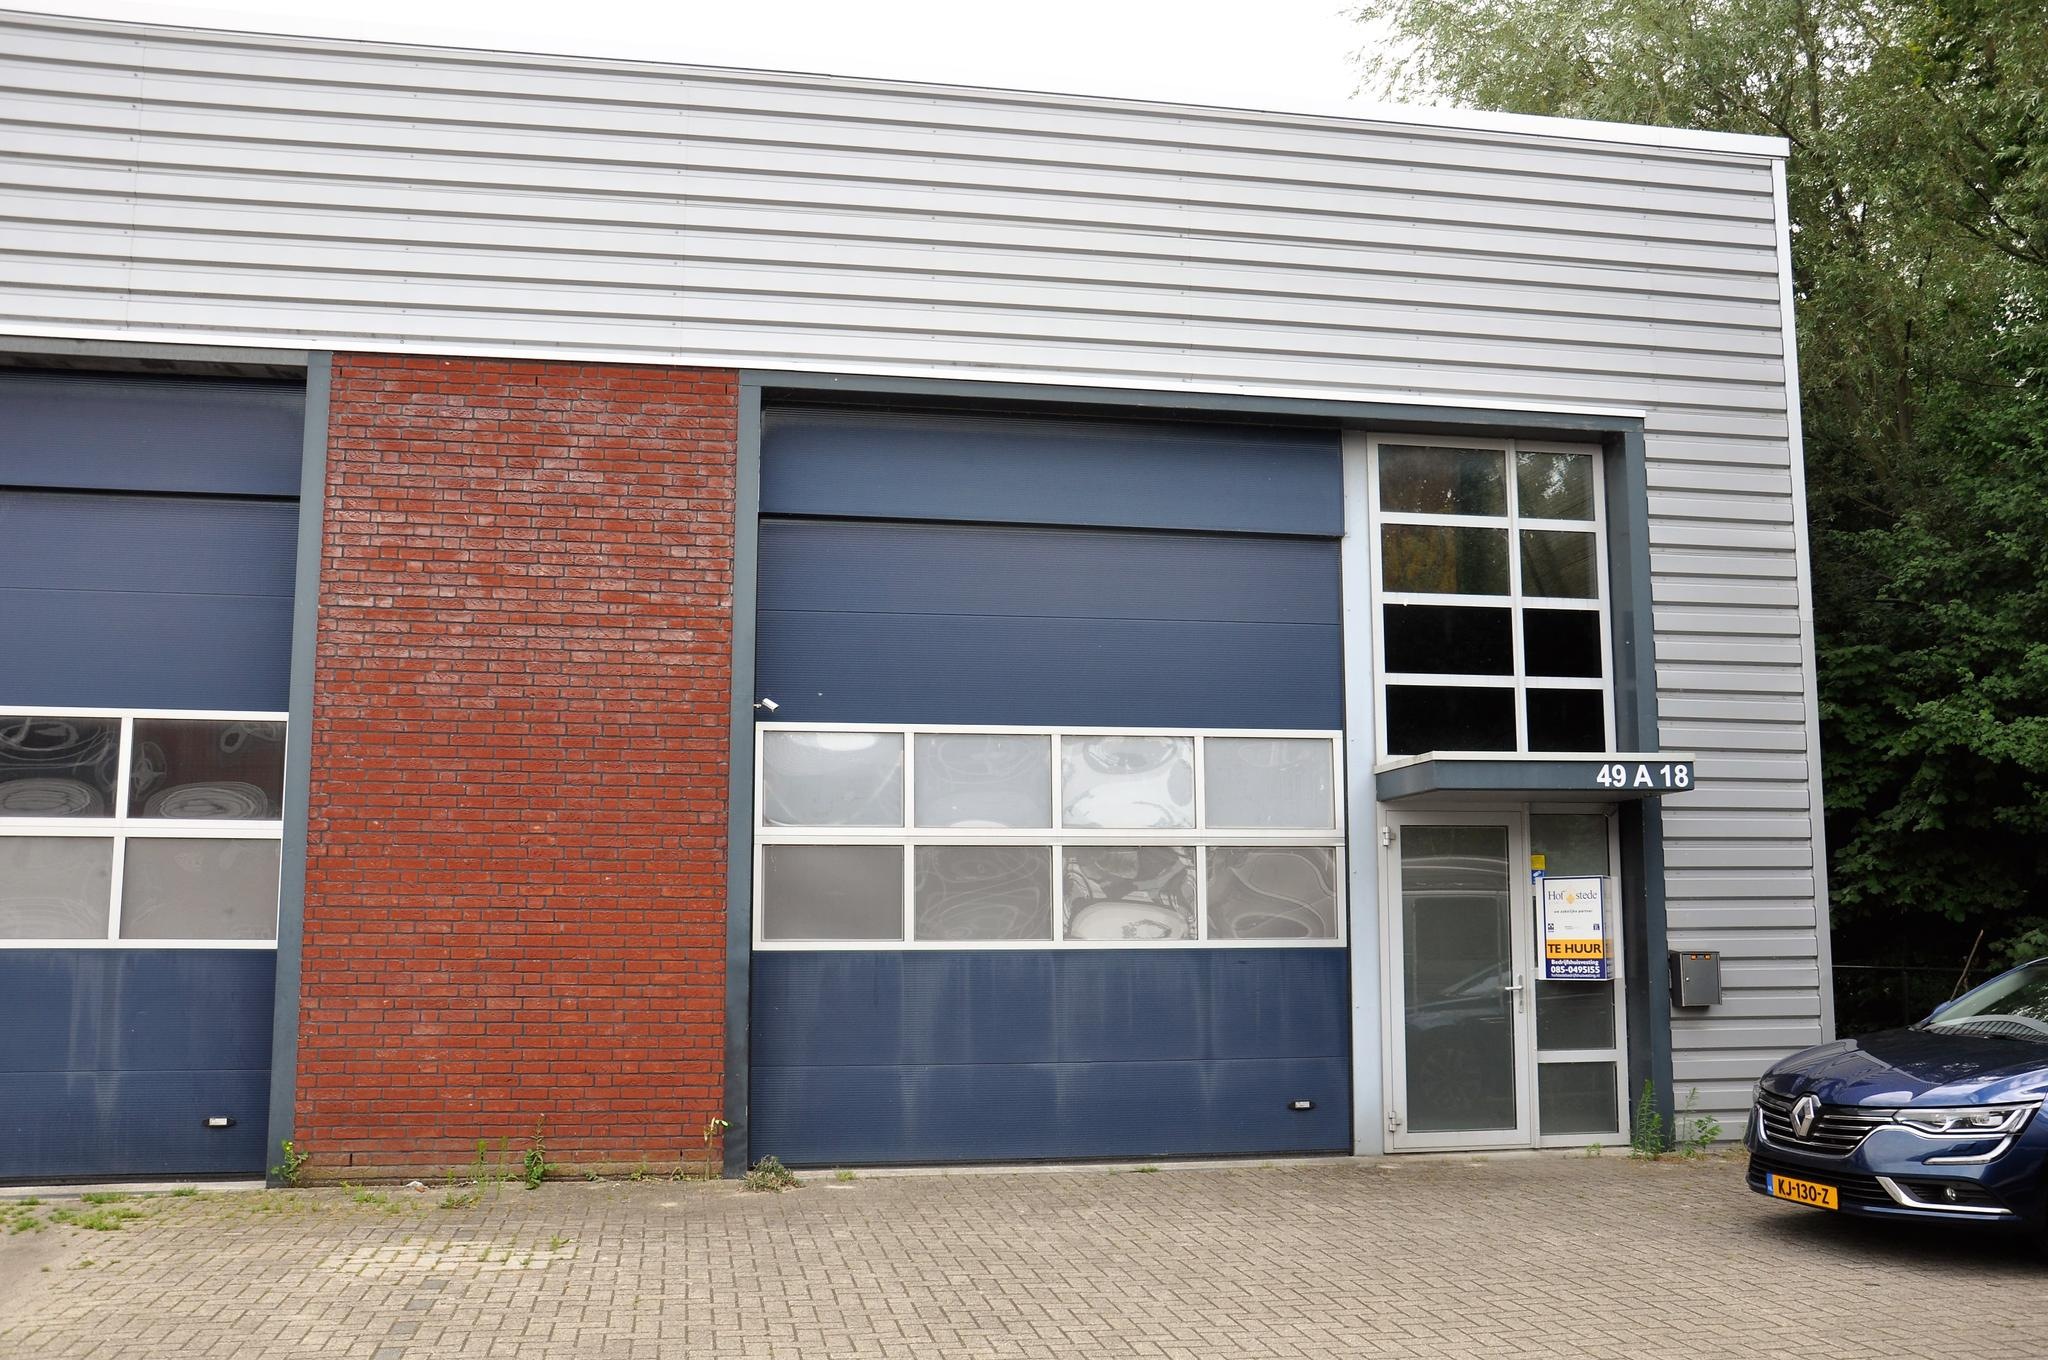 Vierlinghstraat 49 A18 In Werkendam 4251 Lc Bedrijfsruimte